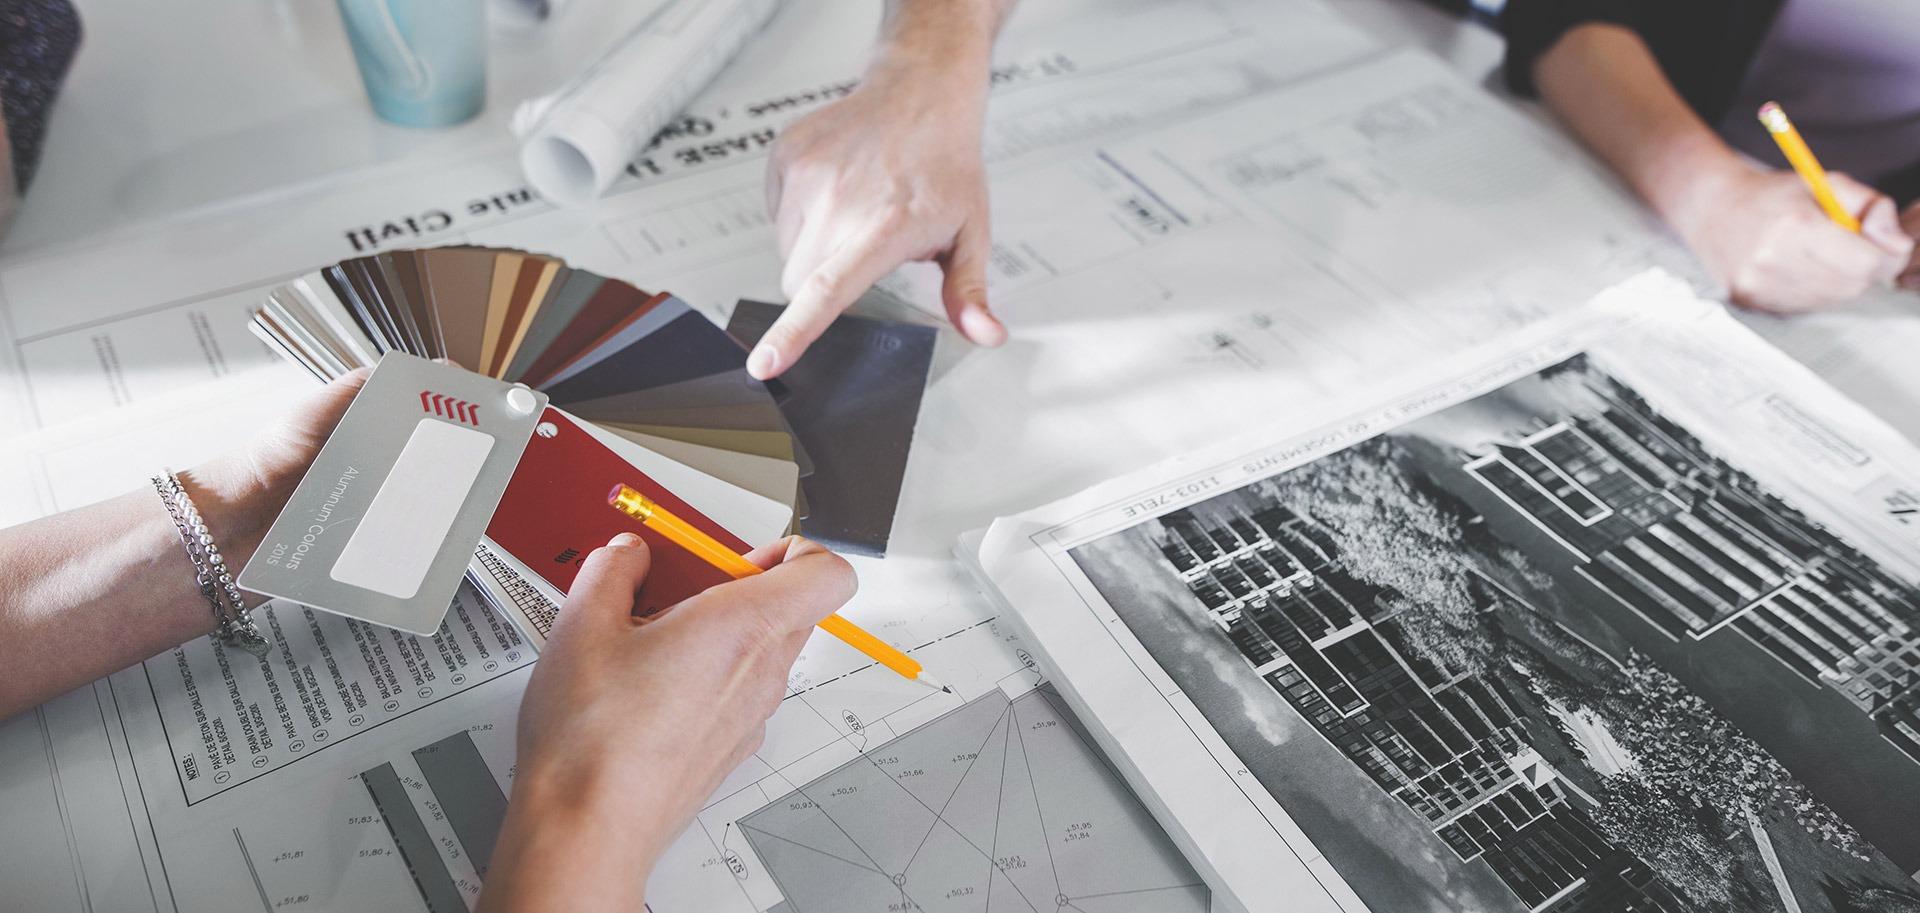 Atelier-H Architecture